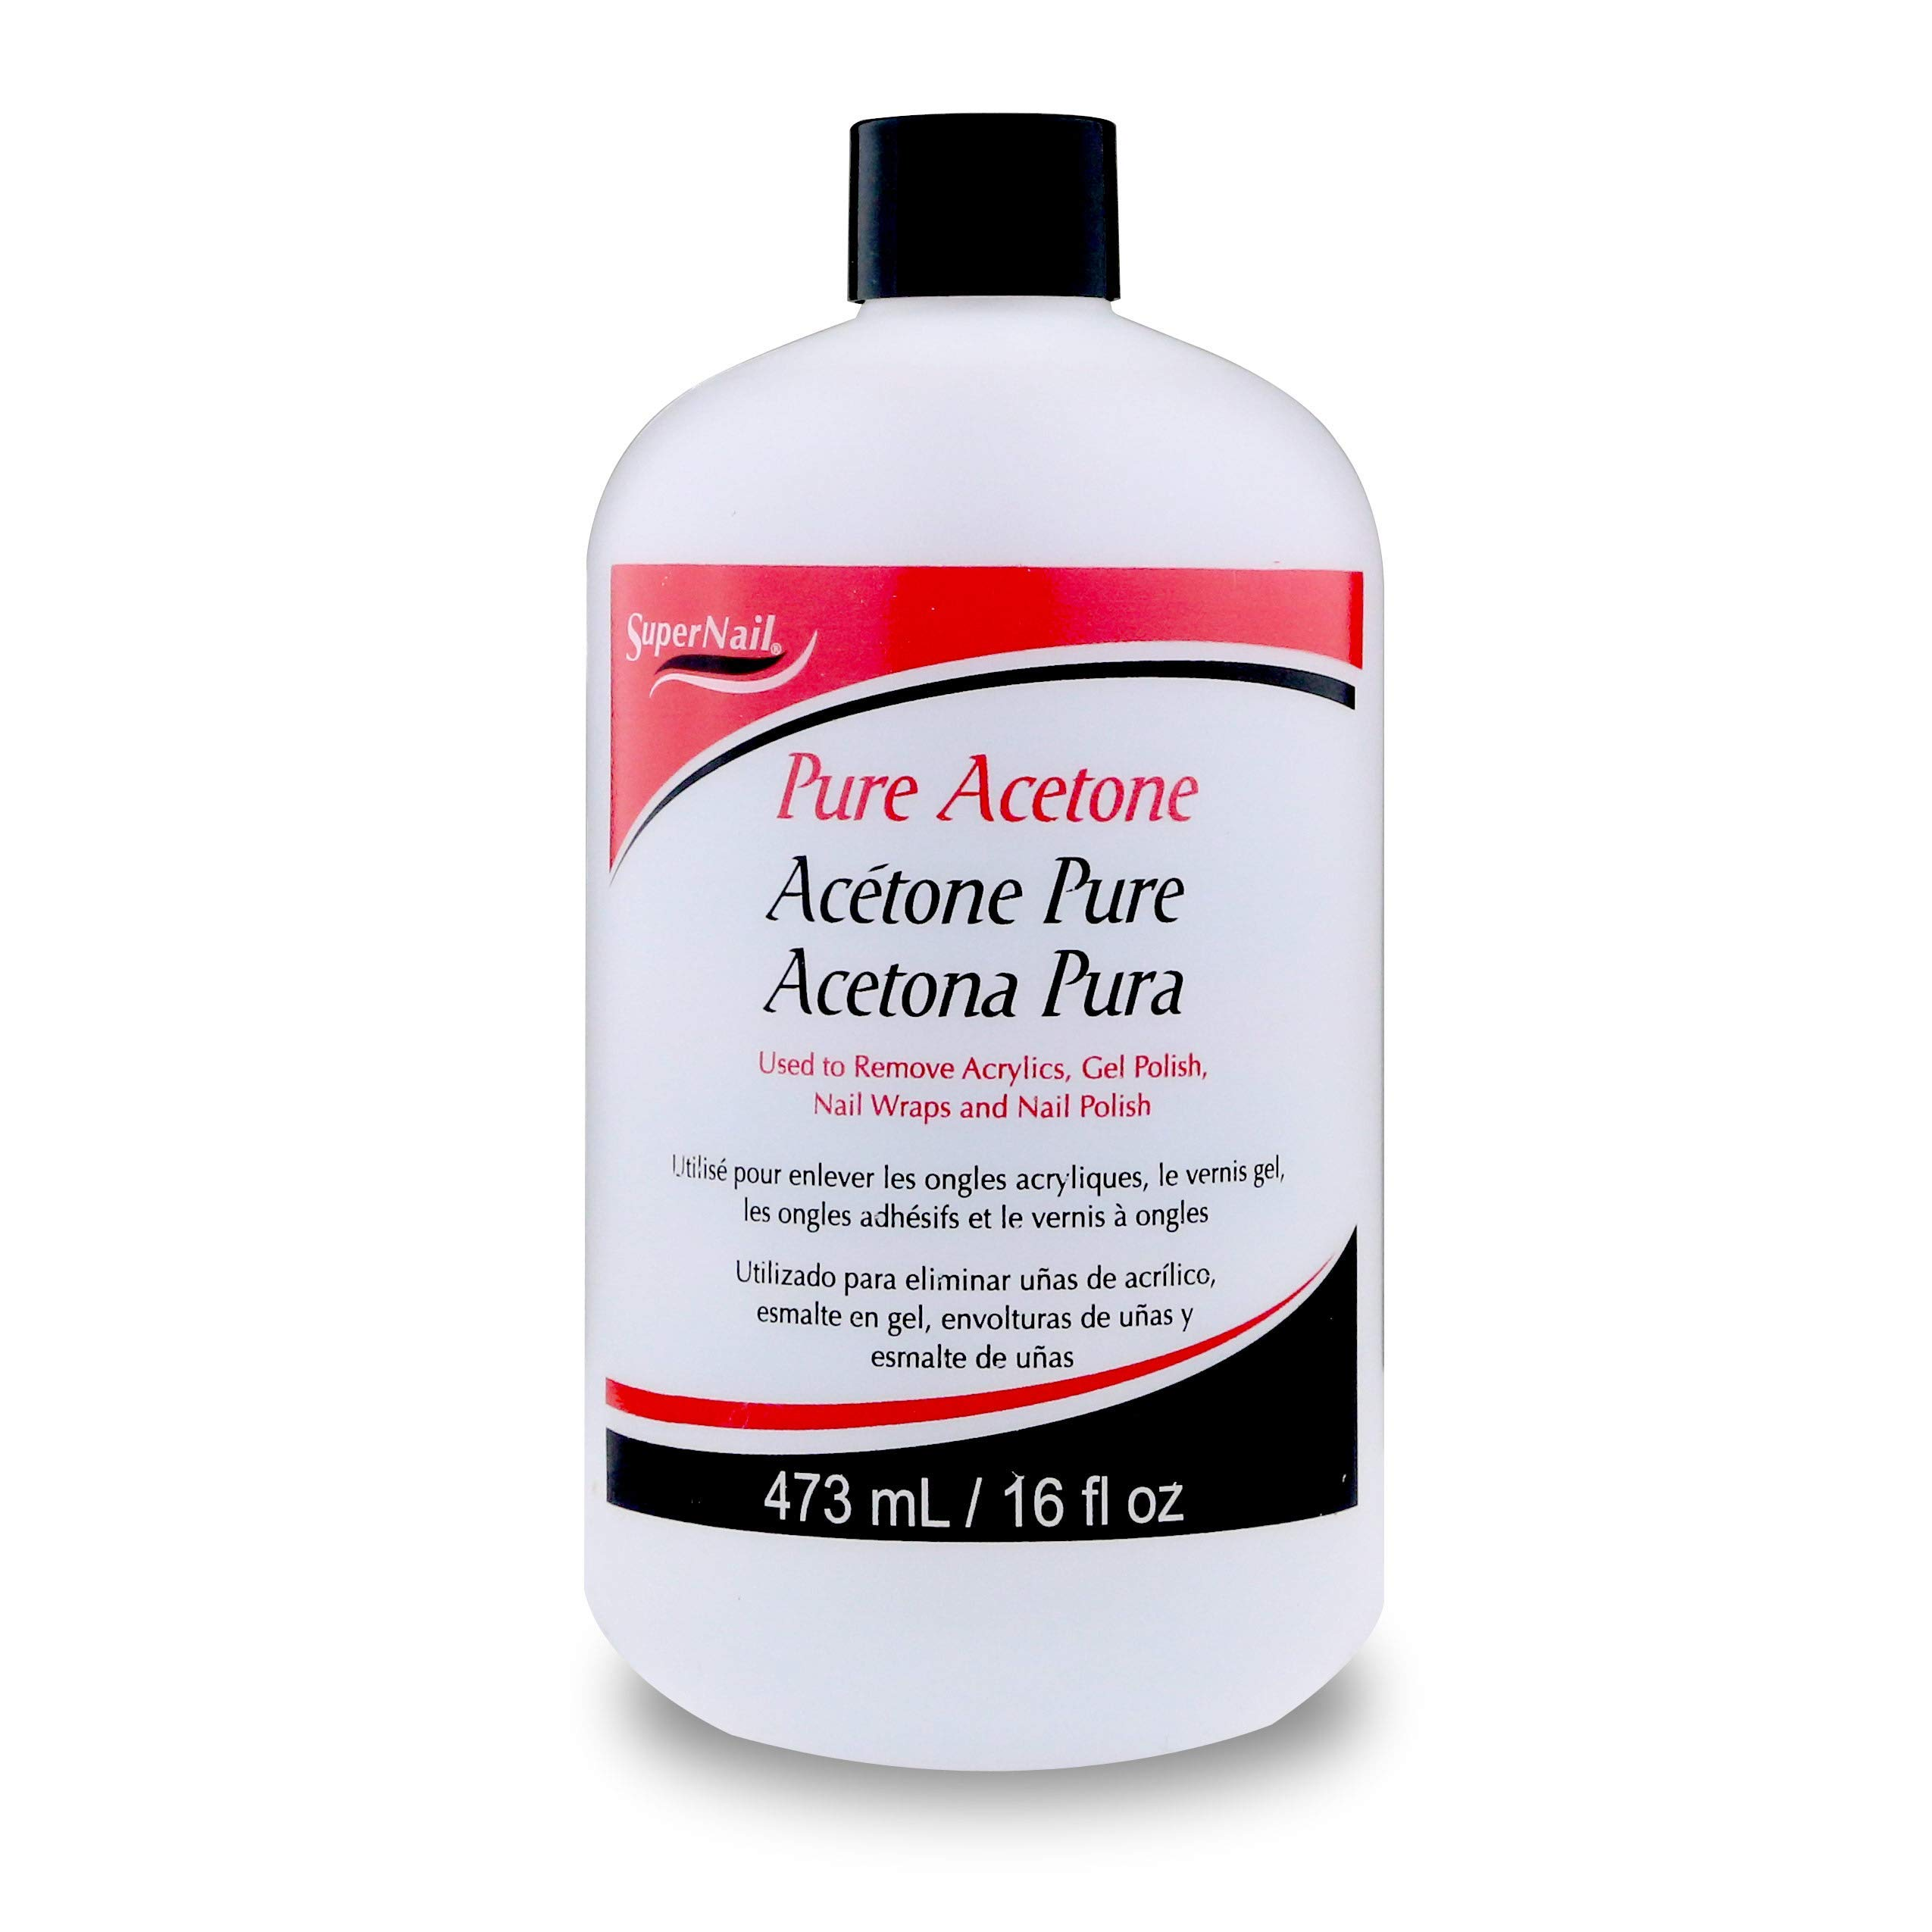 Super Nail Pure Acetone, AS SHOWN 16 Fl Oz